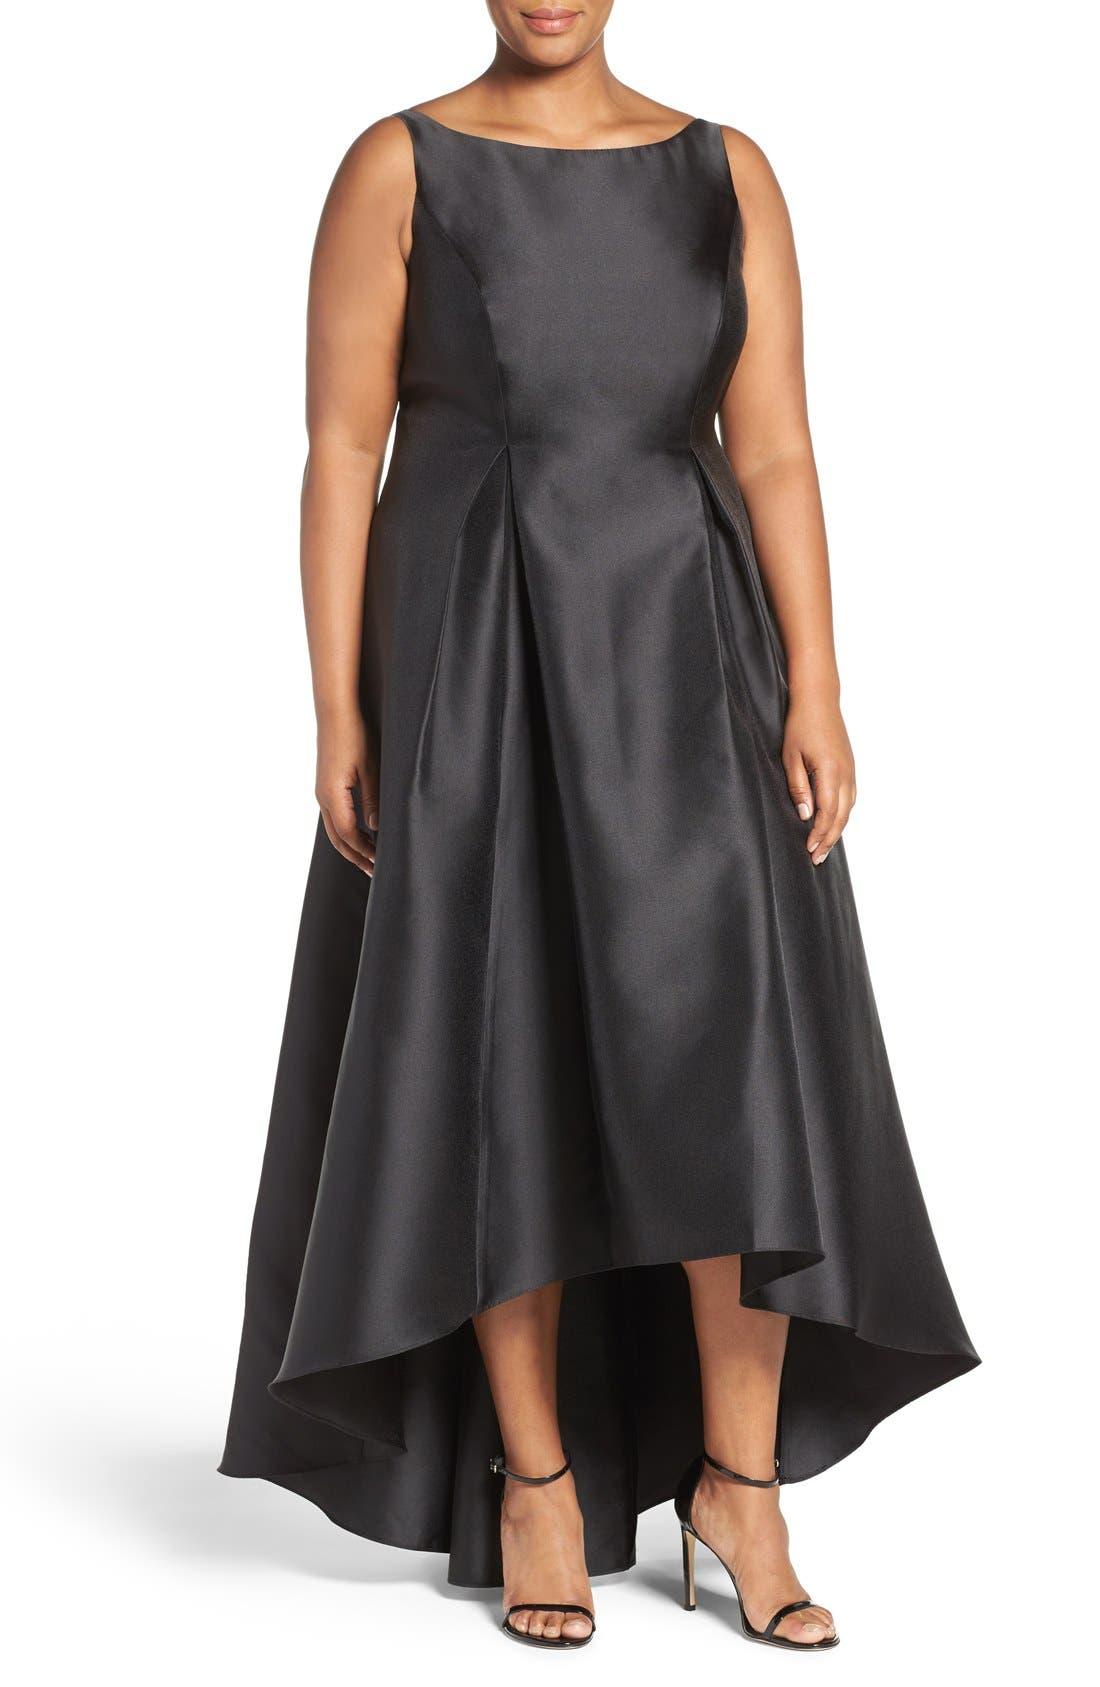 Alternate Image 1 Selected - Adrianna Papell Arcadia Sleeveless High/Low Mikado Ballgown (Plus Size)